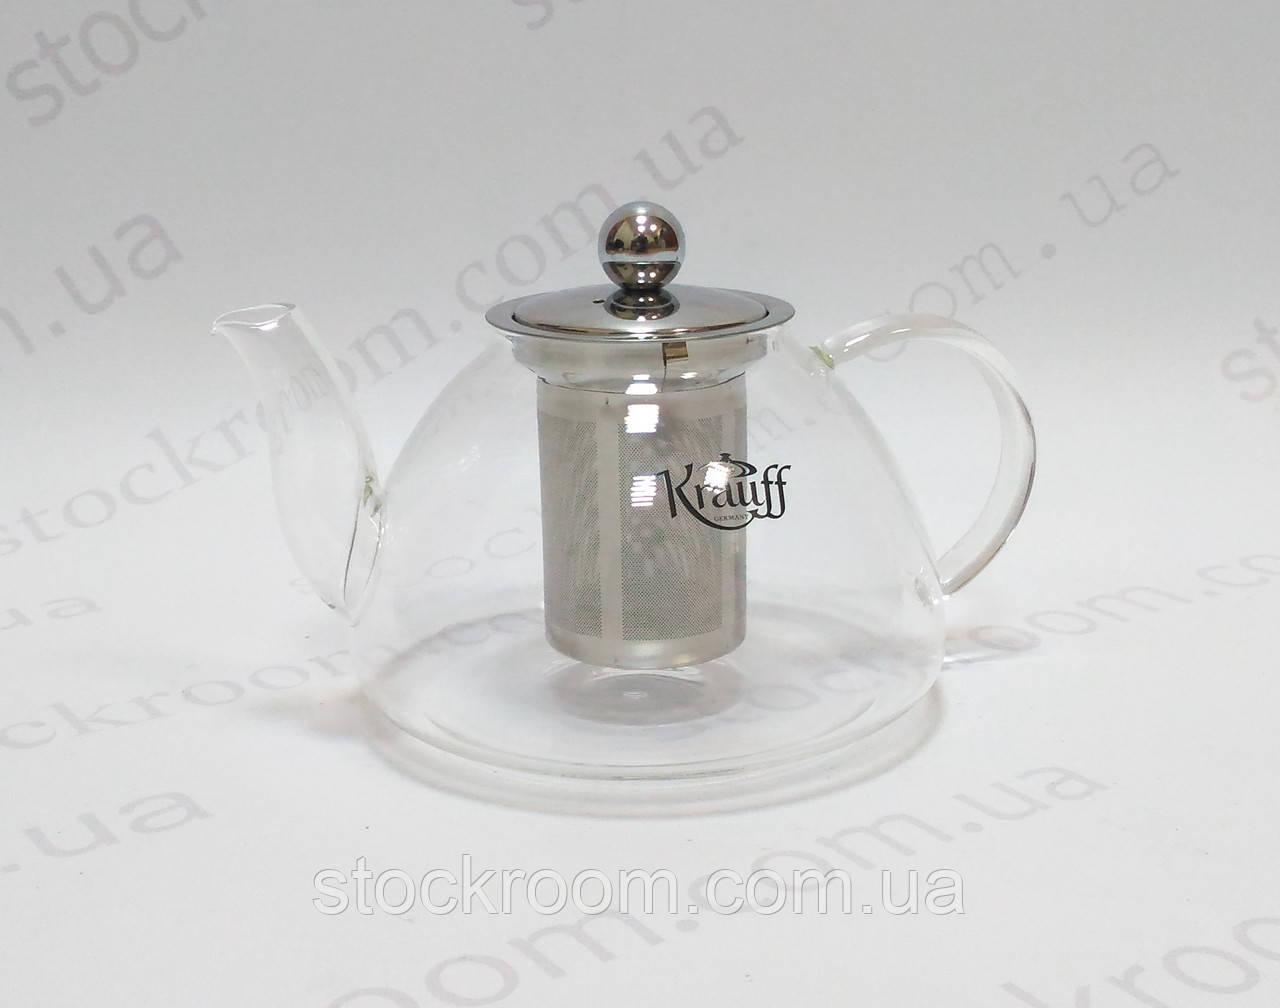 Заварник Krauff 26-177-031 стеклянный ~ 1200 мл